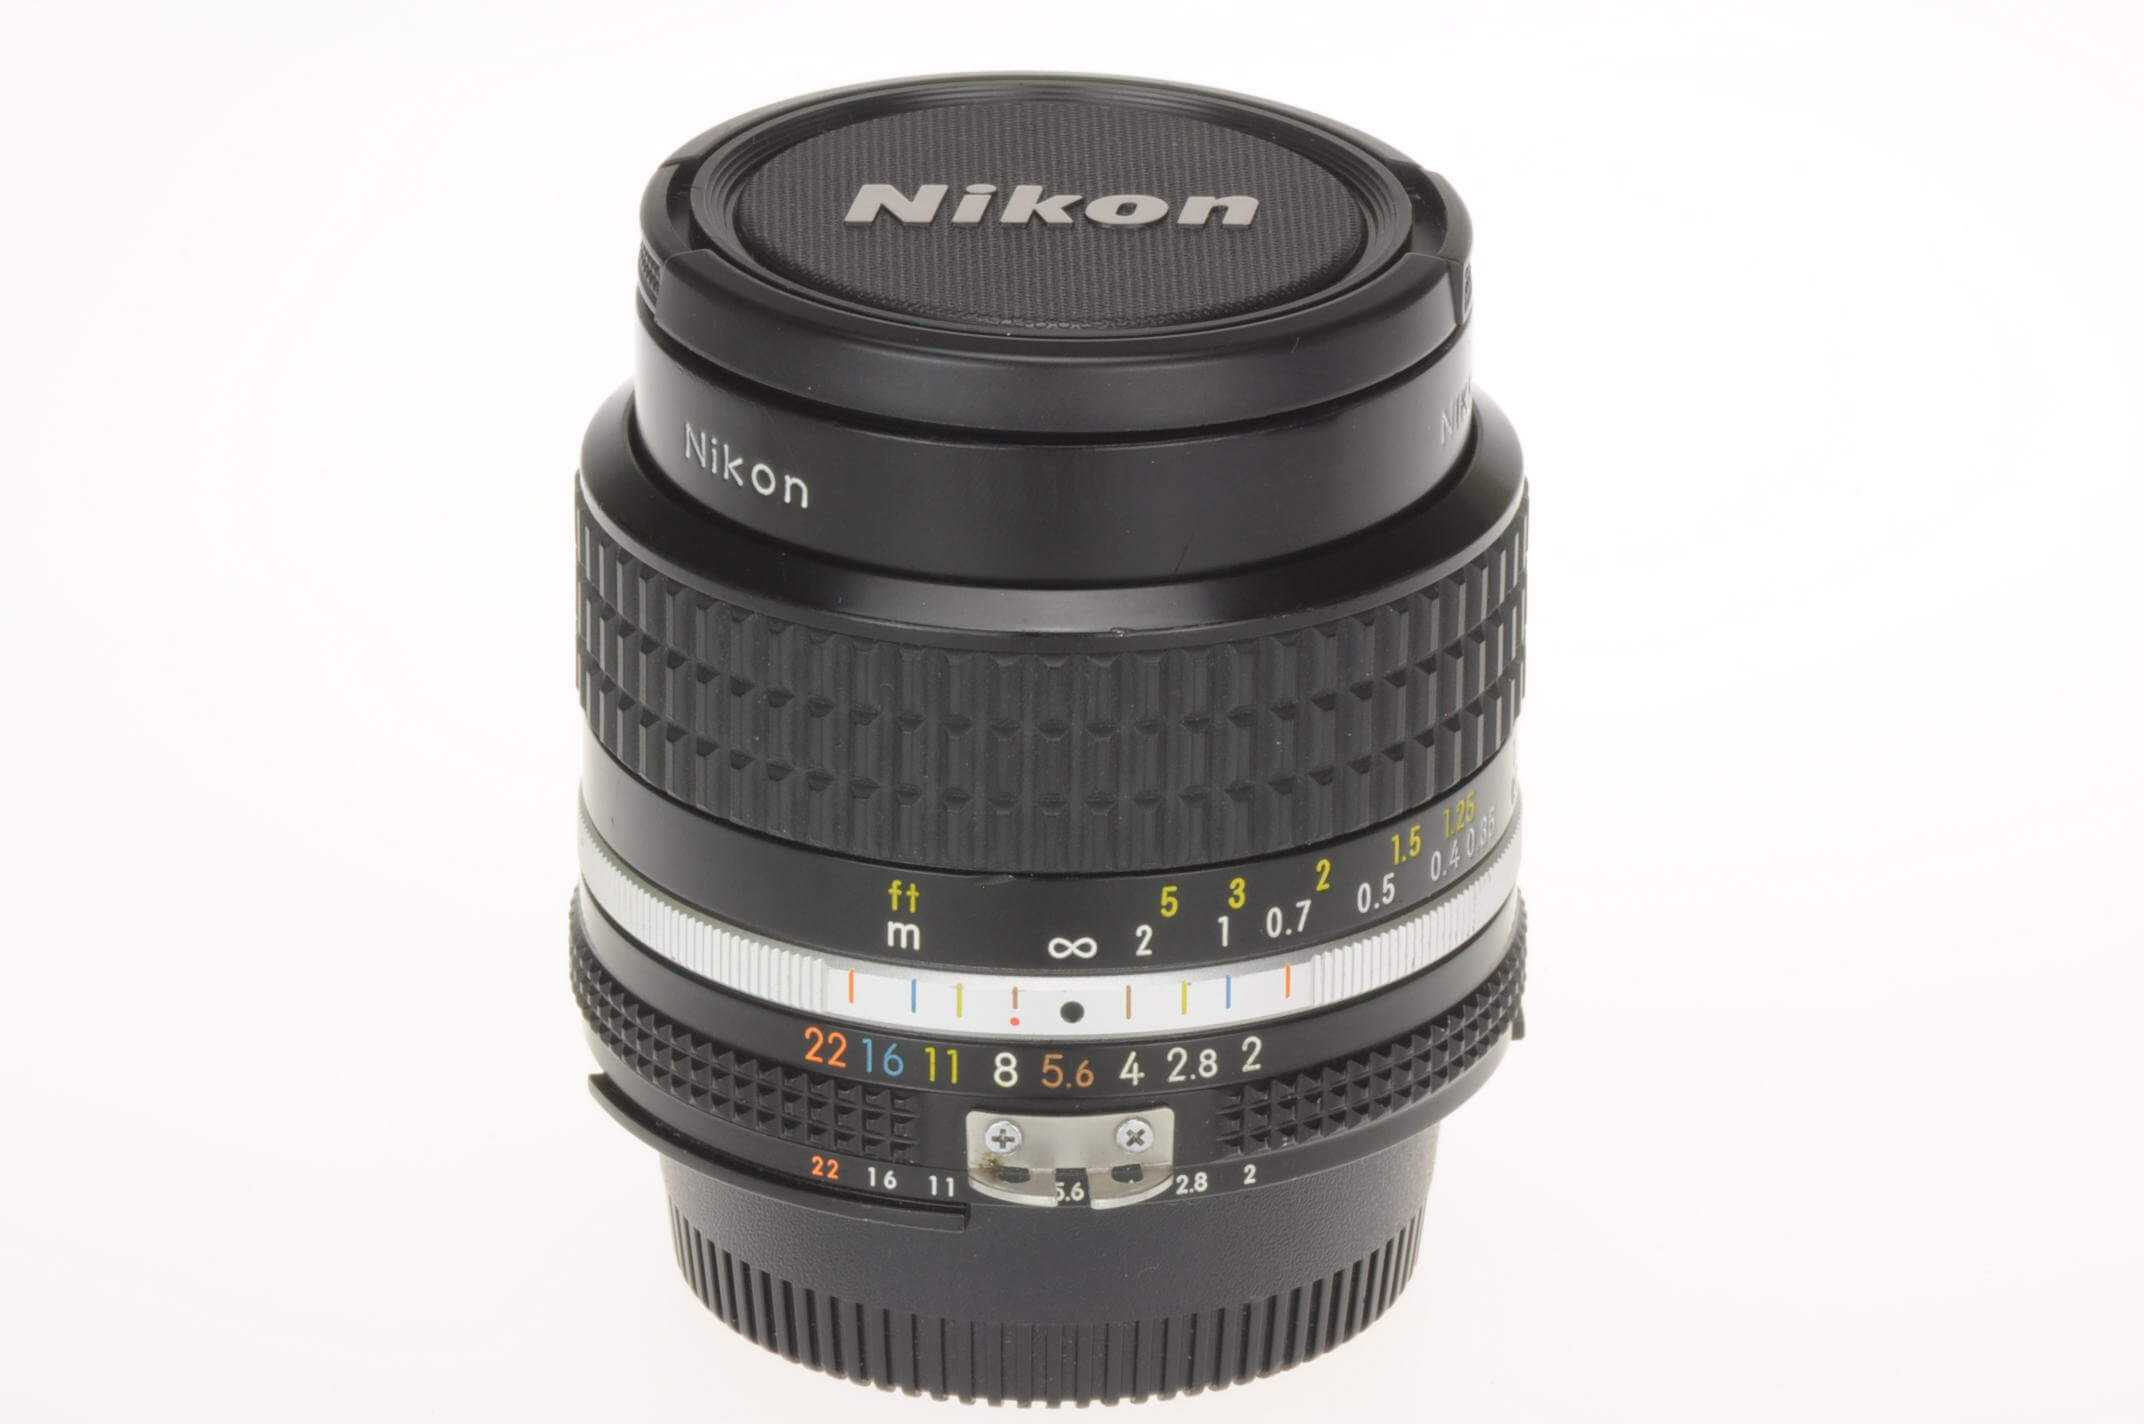 Nikon 24mm f2 Nikkor AIS, superb condition, virtually mint!